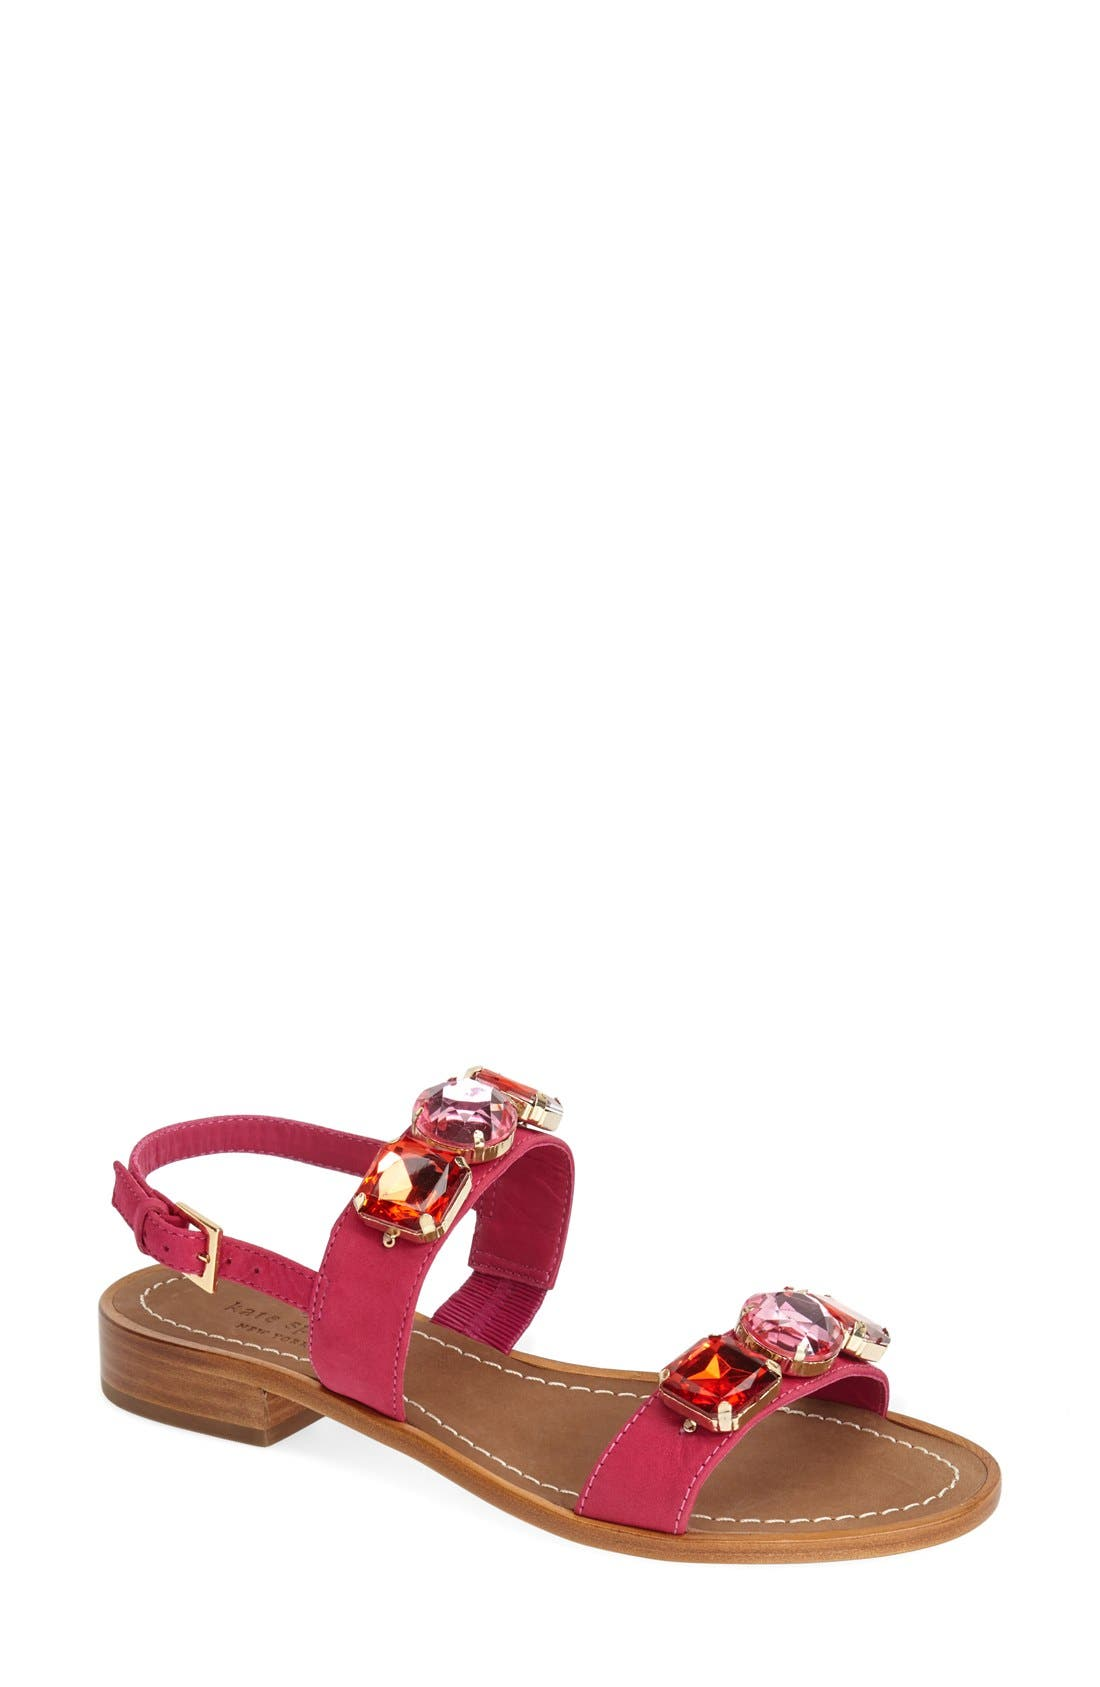 Alternate Image 1 Selected - kate spade new york 'bacau' ornate double band sandal (Women)